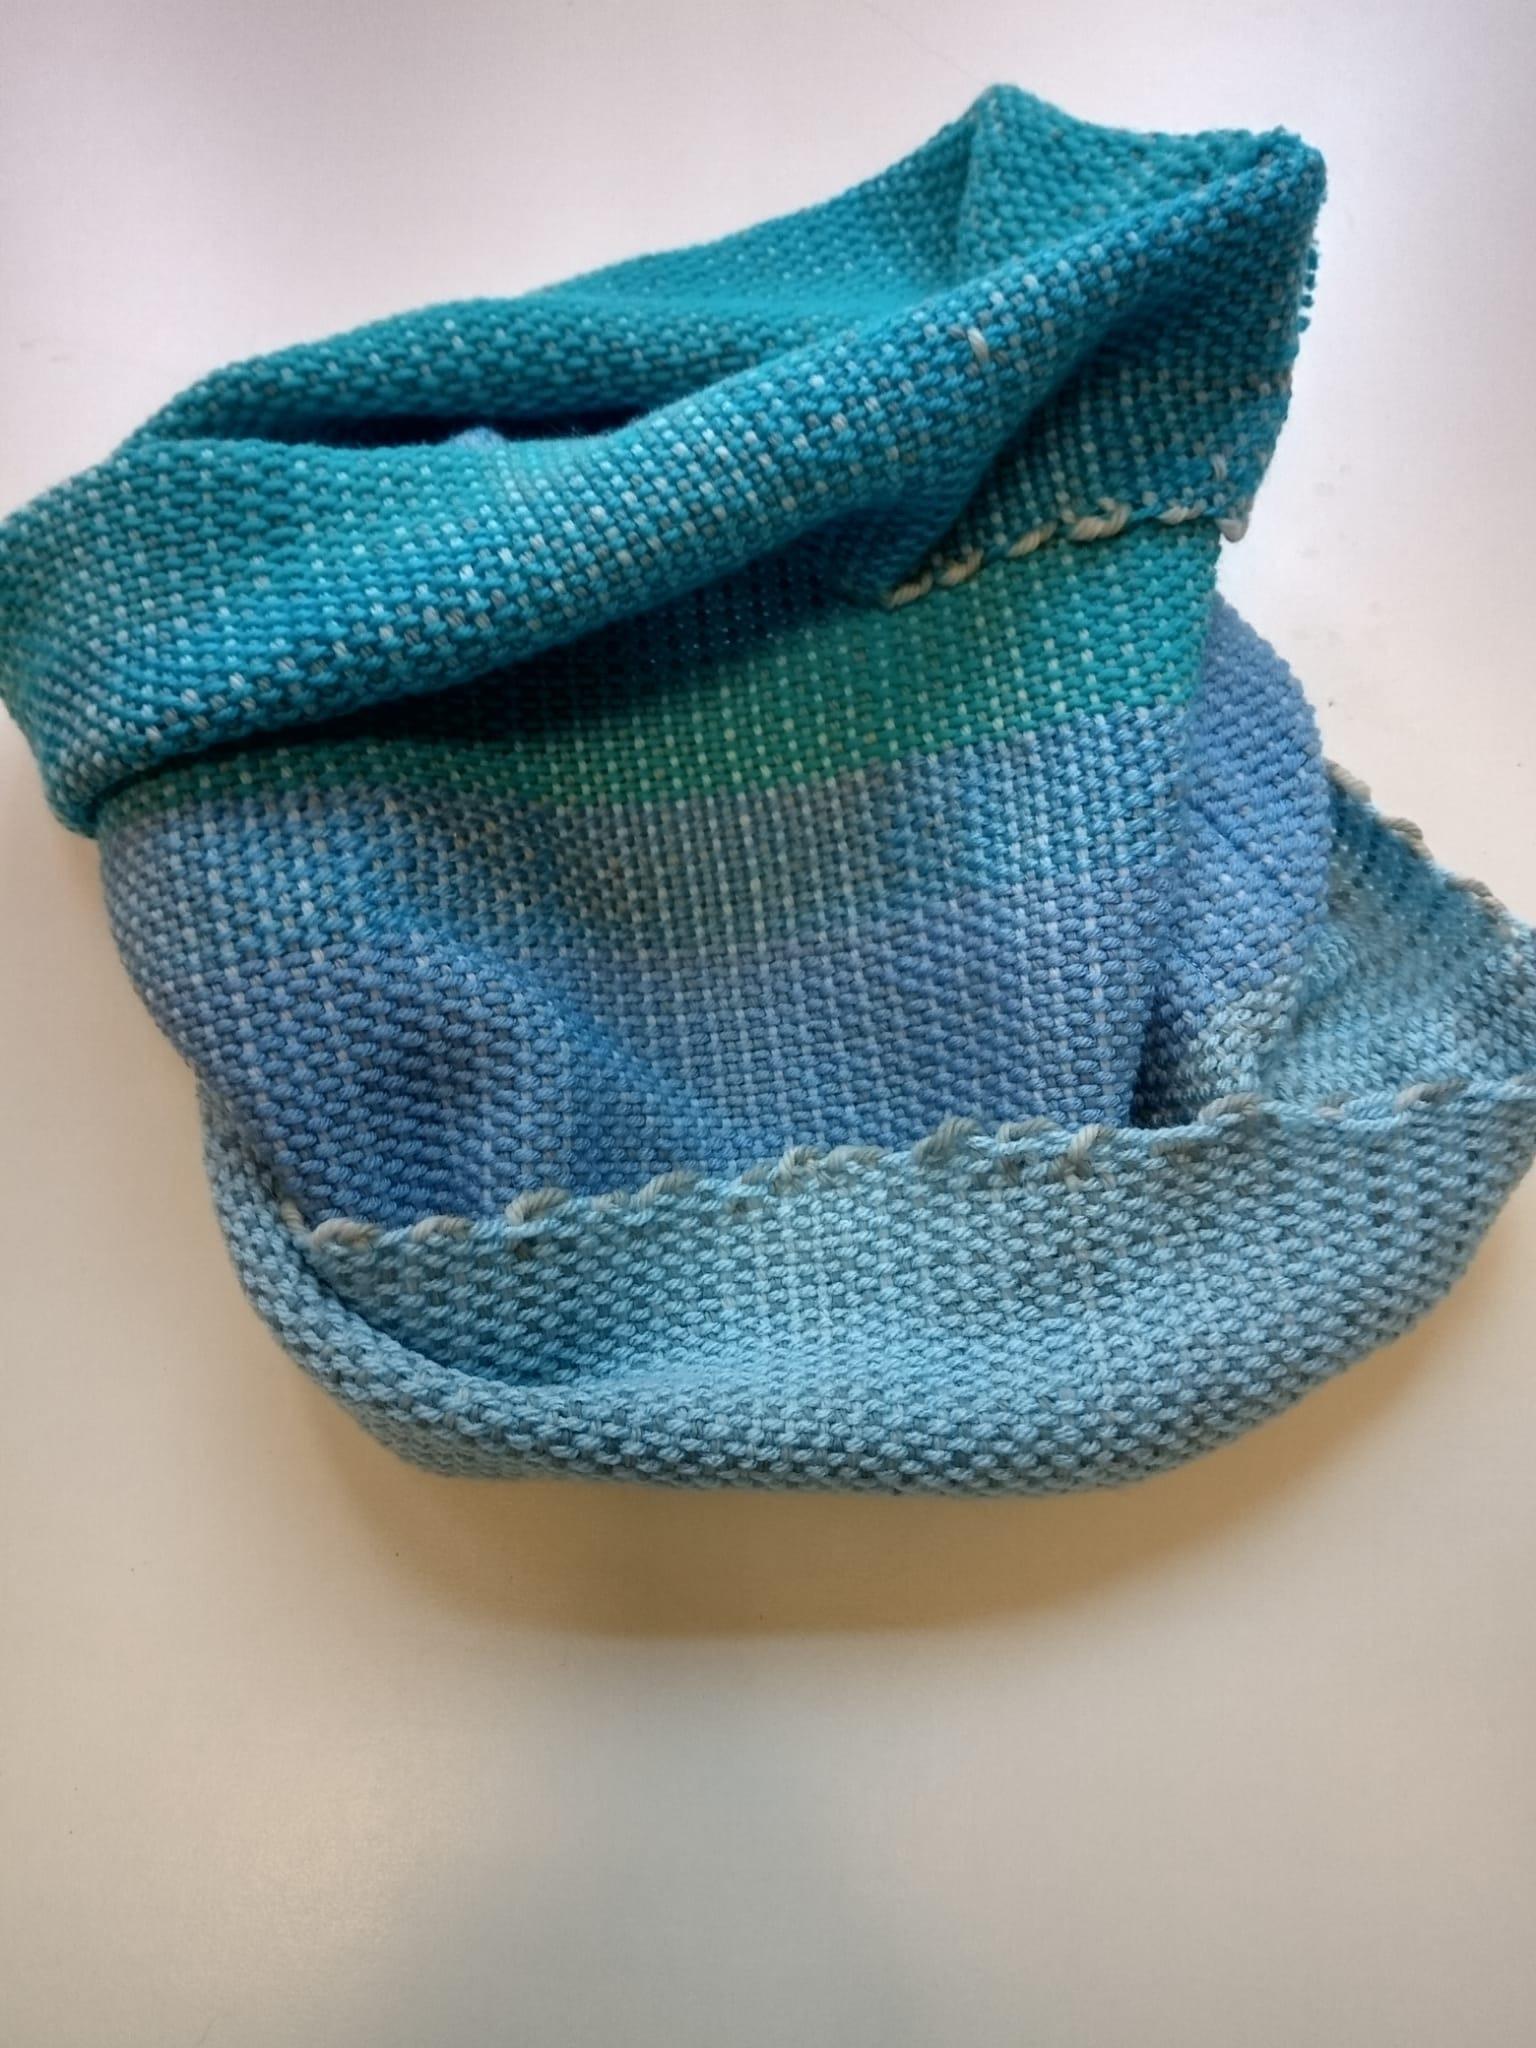 Fascia scaldacollo in lana Image